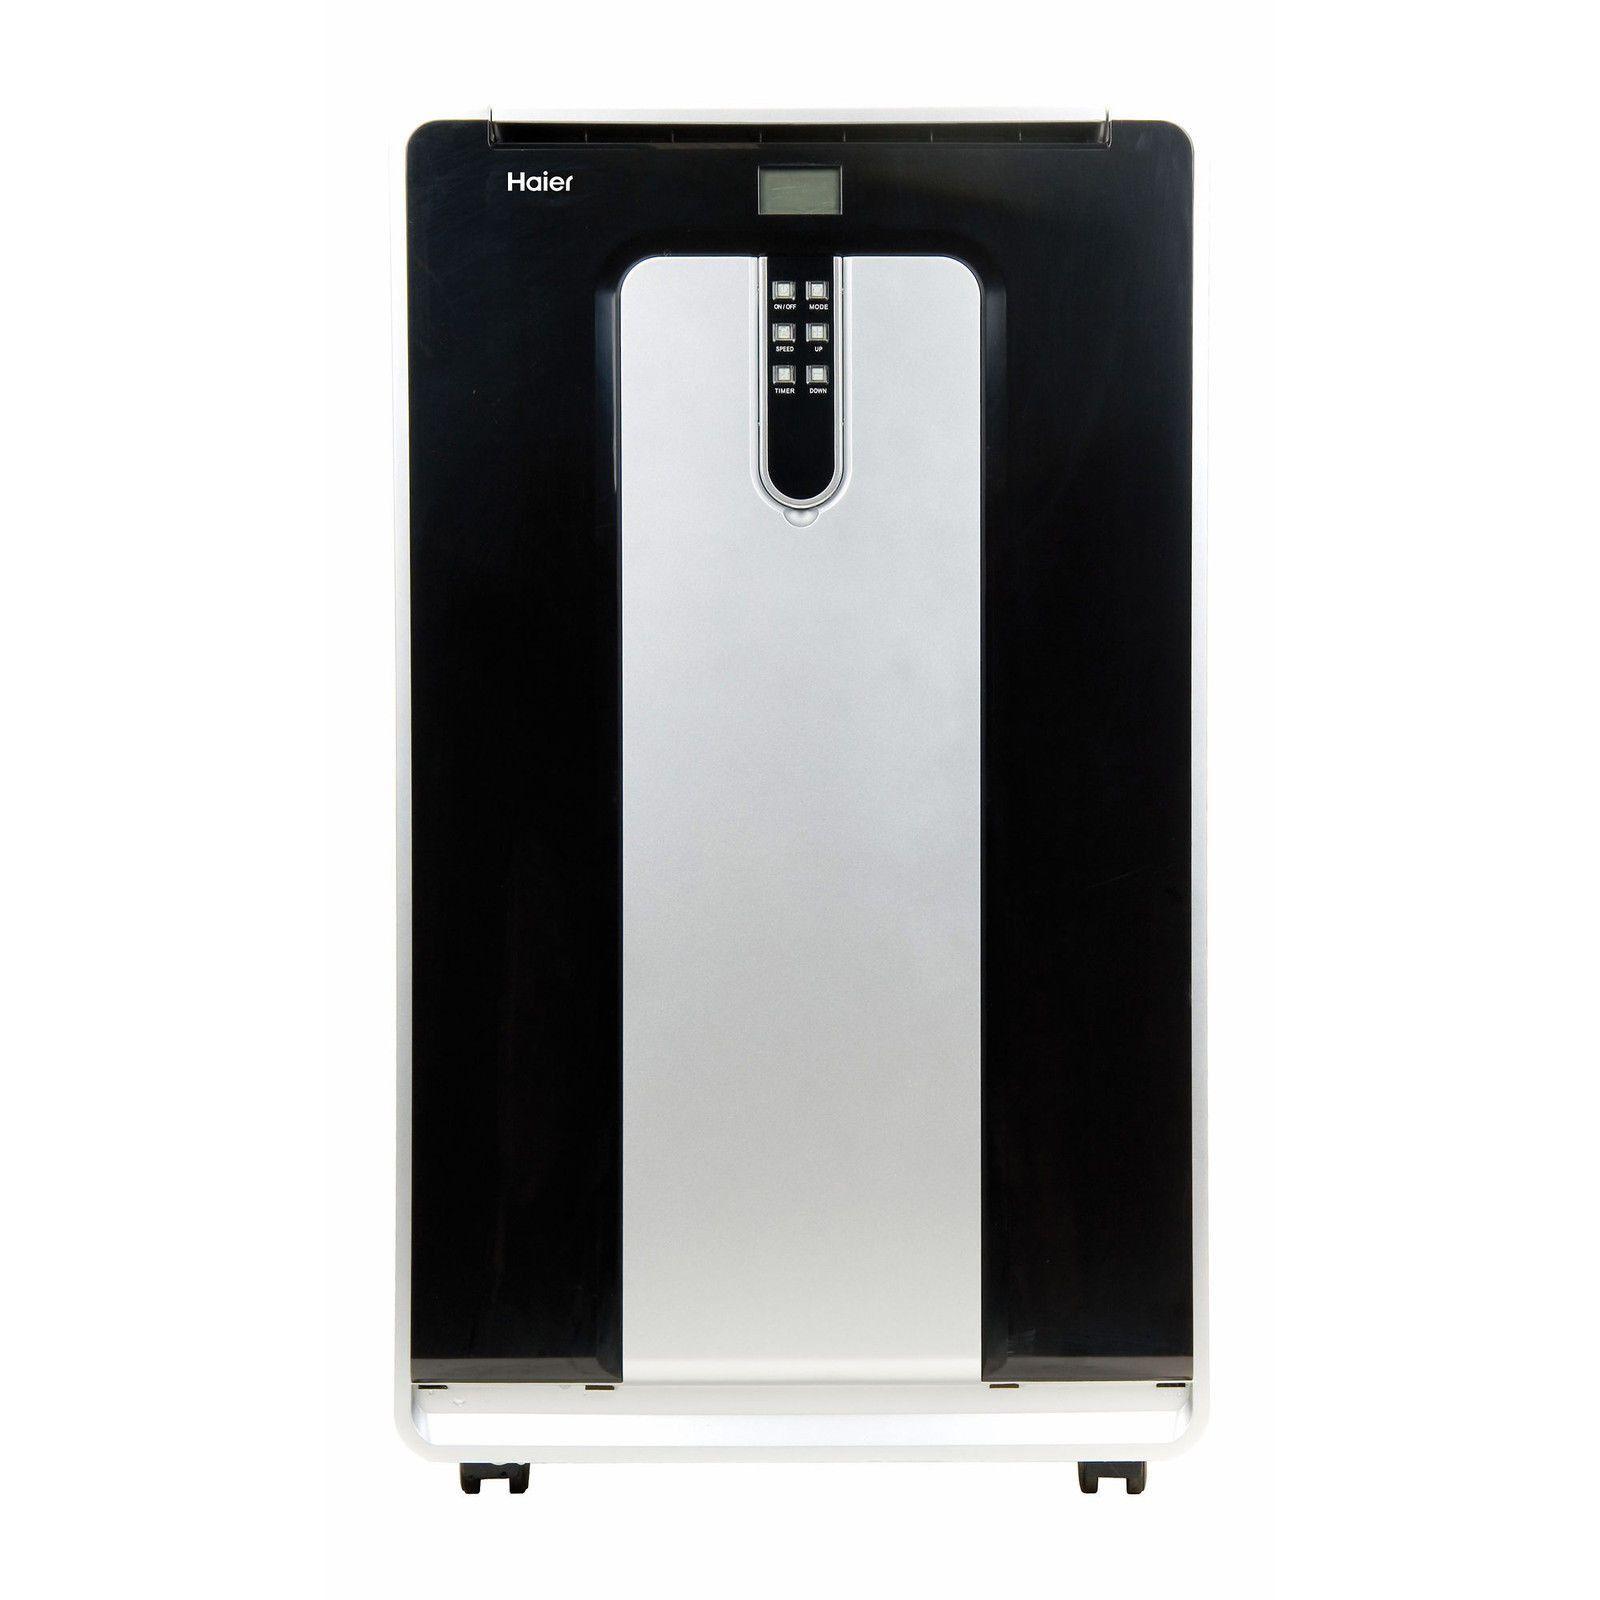 new haier 13500 btu 3 speed 600sf portable air conditioner w heater